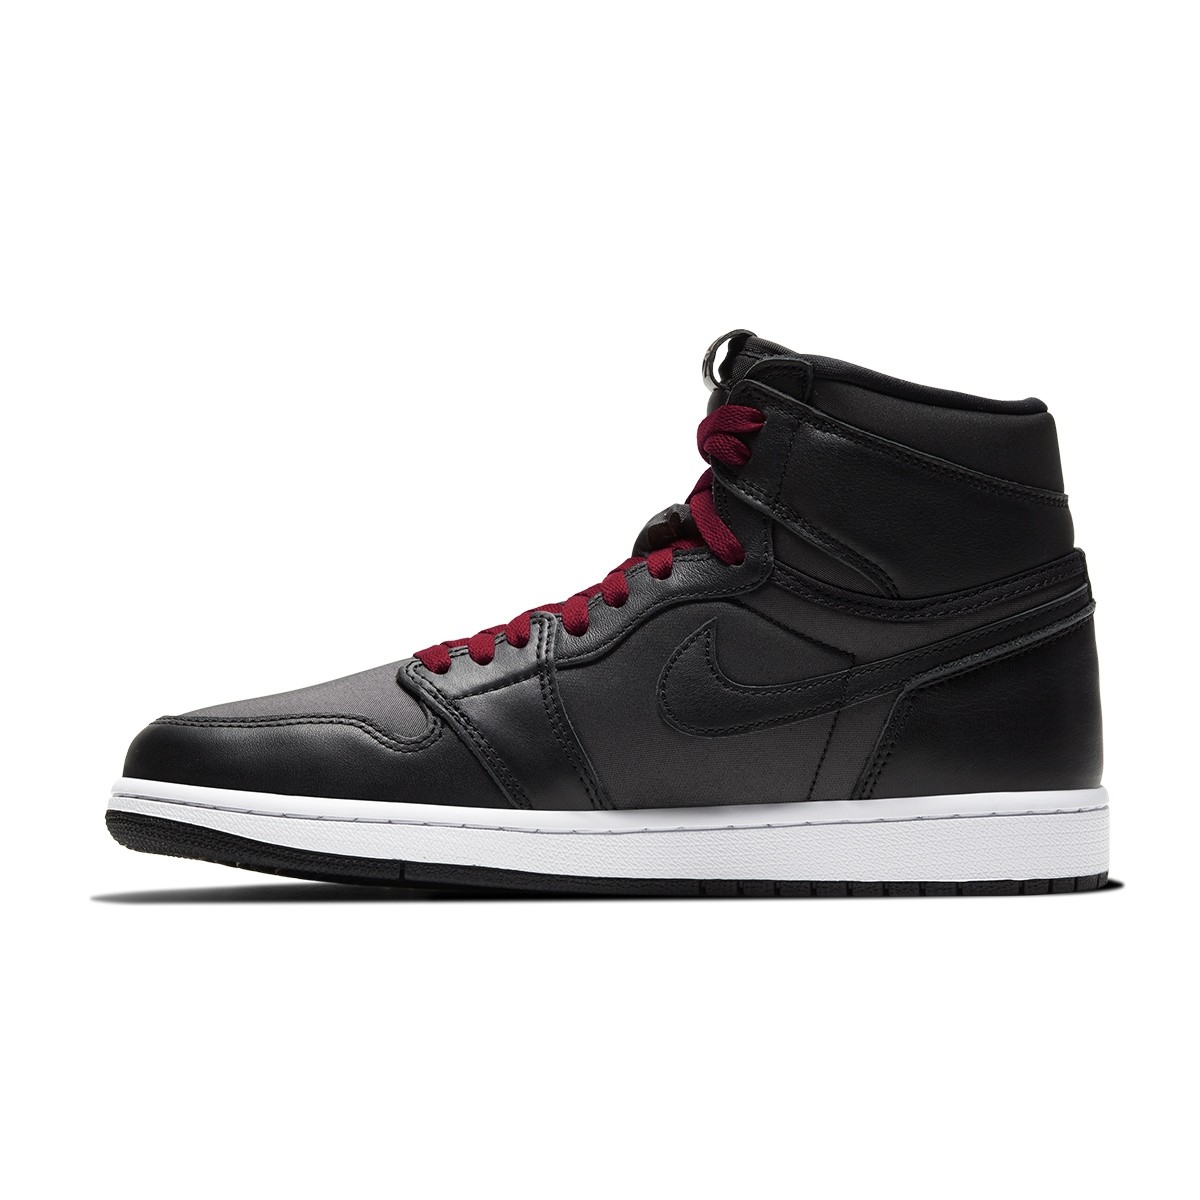 Air Jordan 1 Retro HI OG Jr 'BlackGym Red'